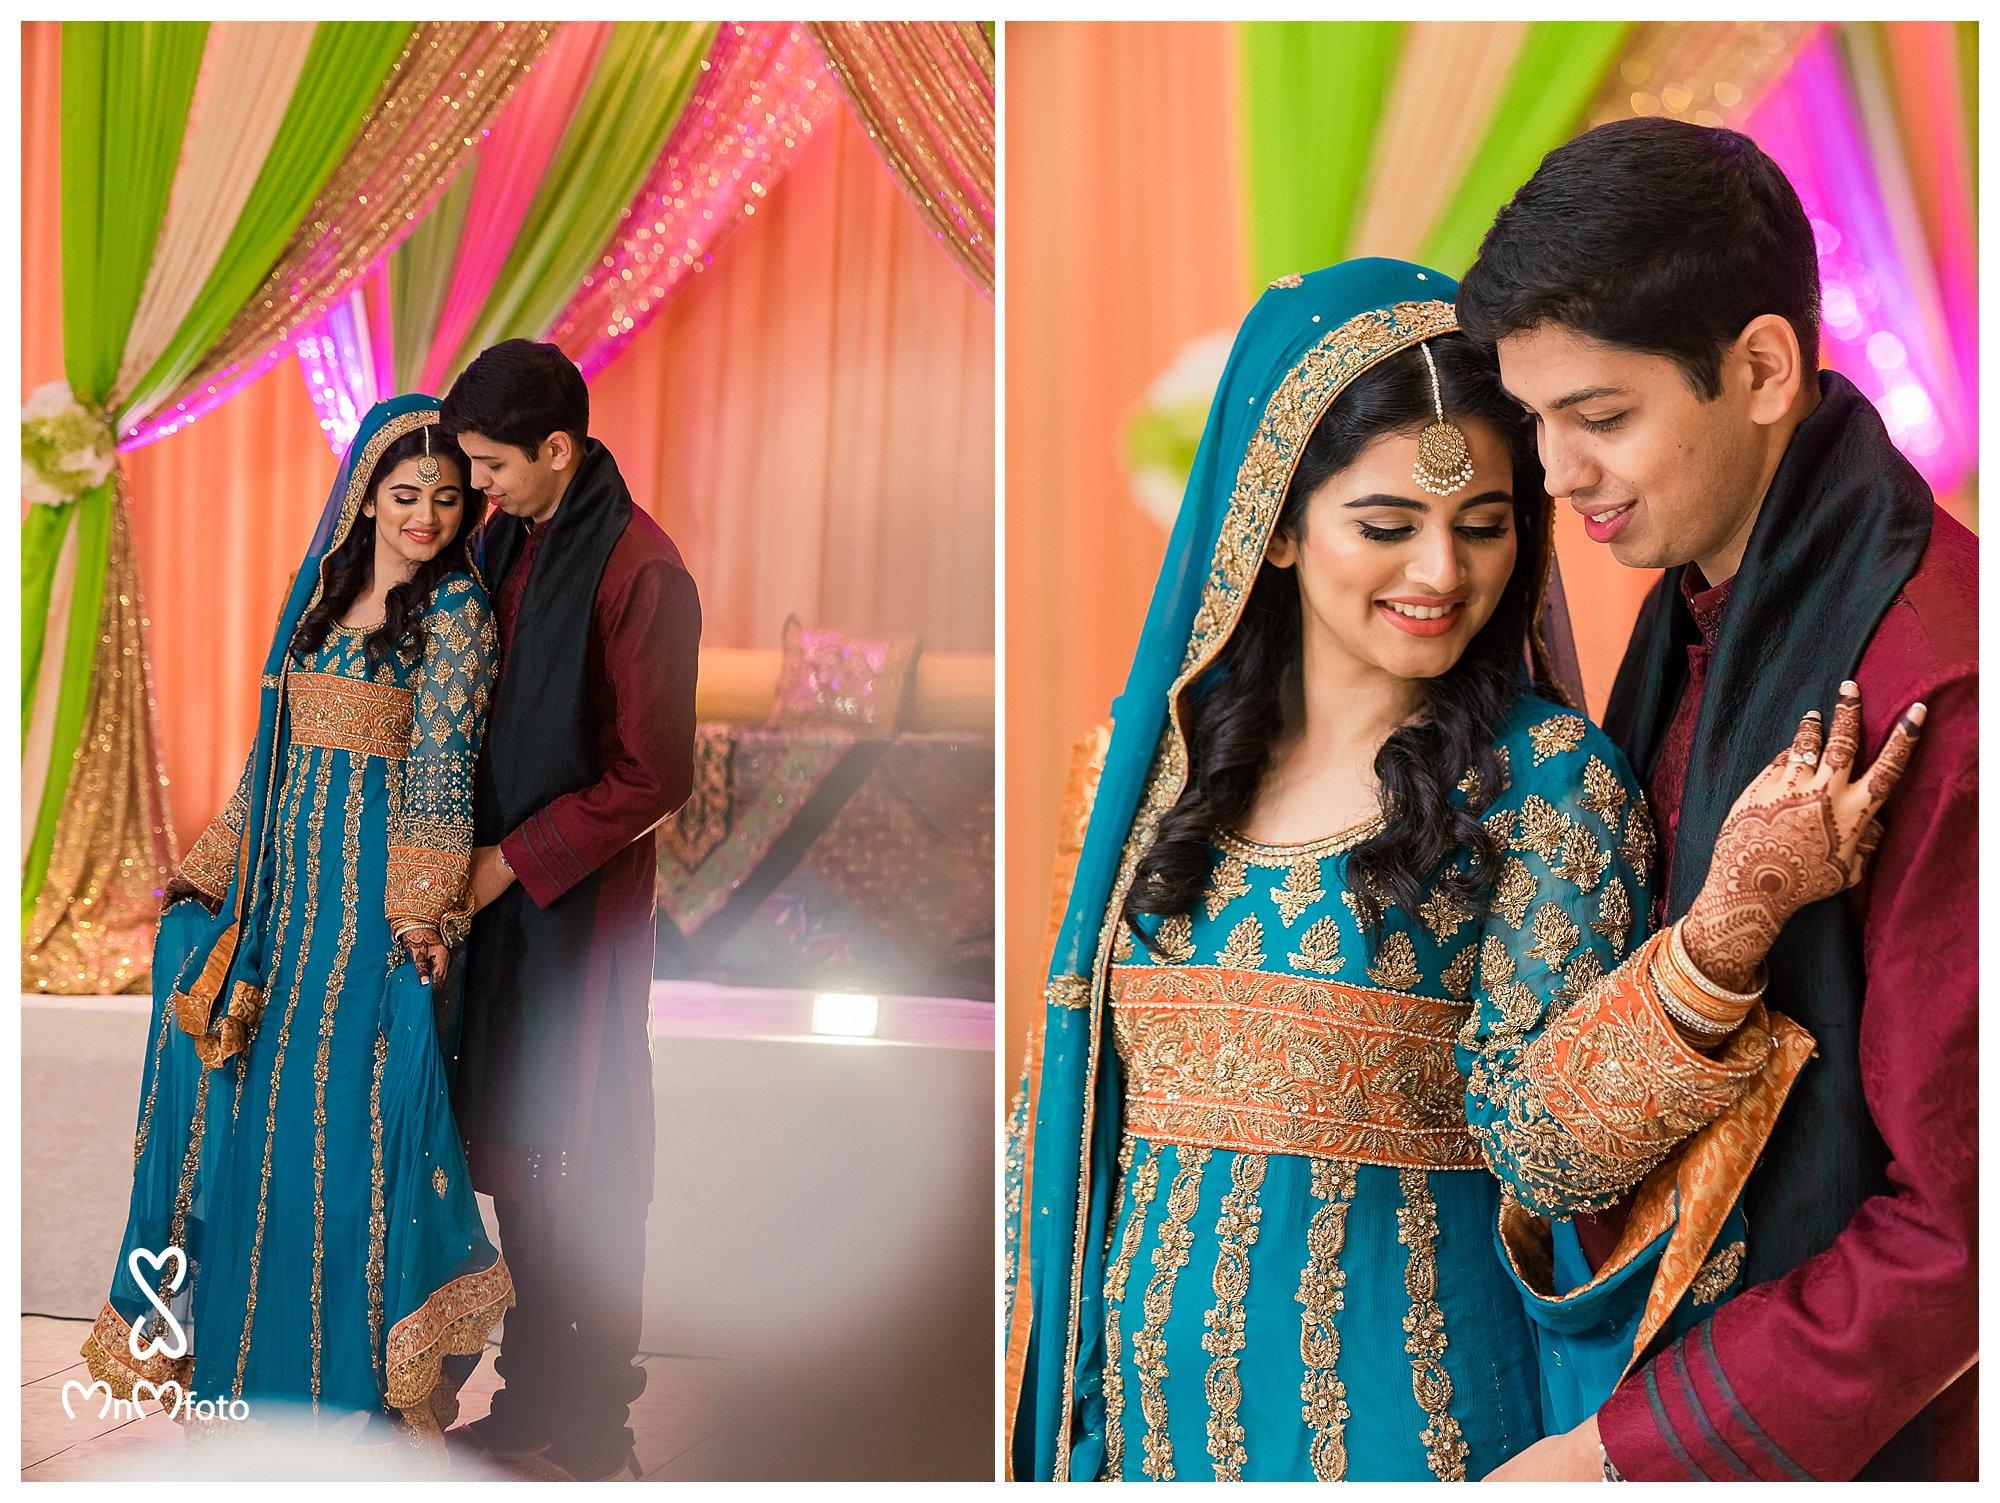 Pakistani Wedding Photographer Dallas | Saad and Sheba Wedding